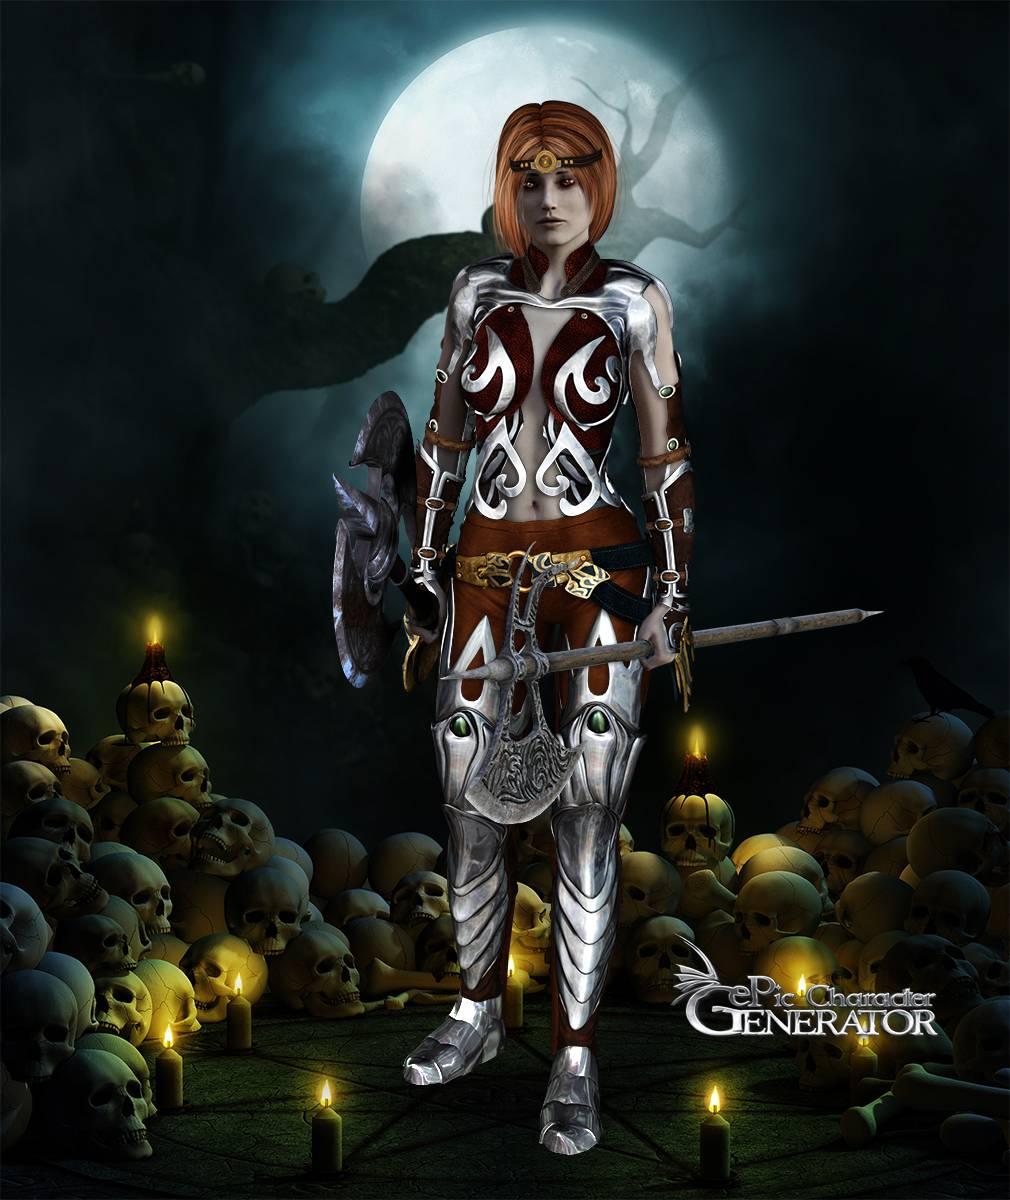 ePic Character Generator Season 2 Female Warrior Screenshot 03